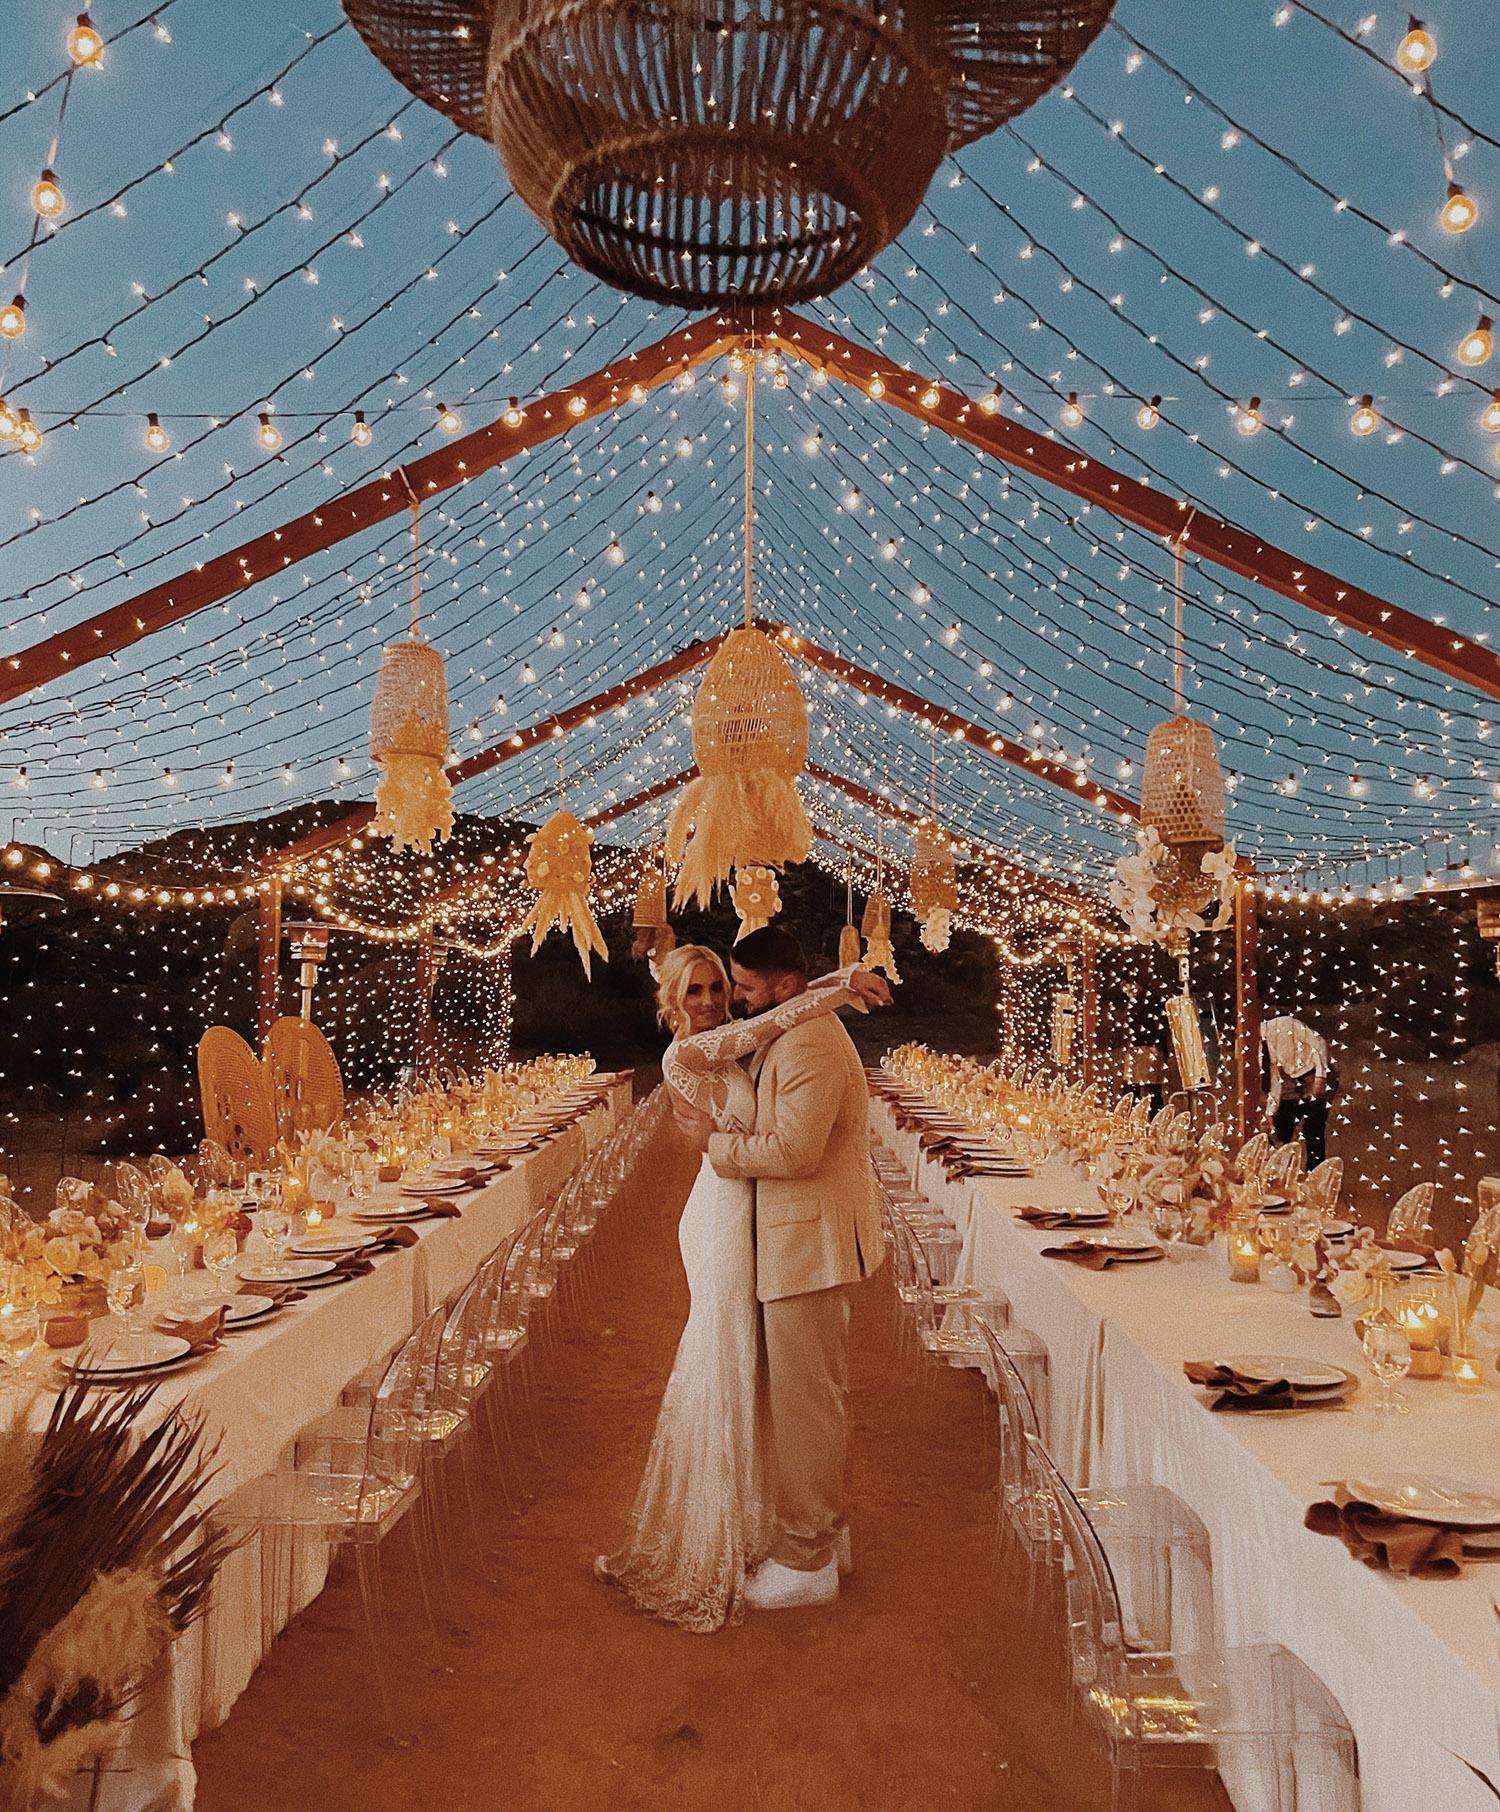 moho joshua tree wedding with couple under fairy lights